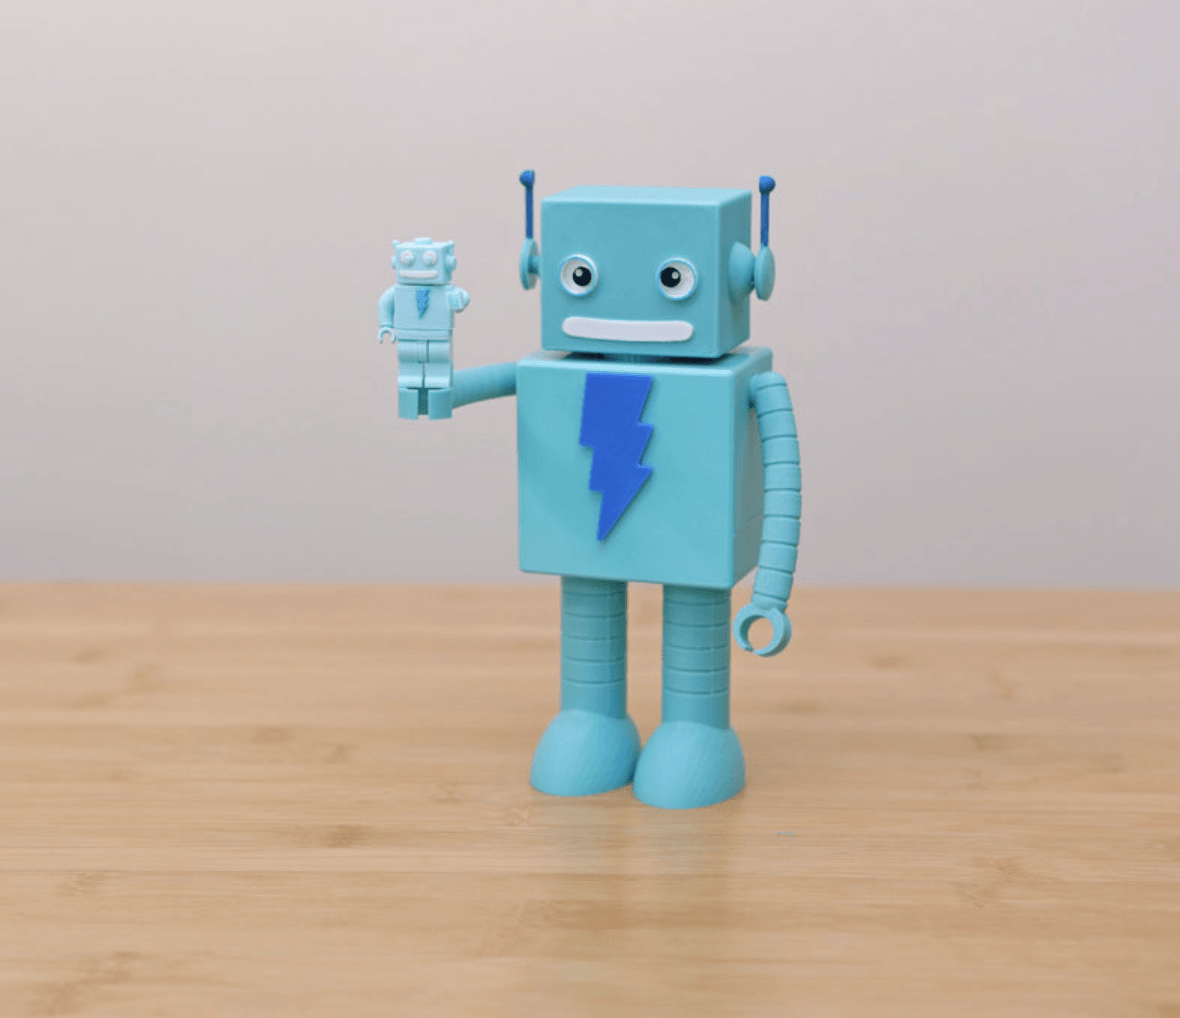 Capture d'écran 2018-03-29 à 10.04.16.png Download free STL file Webcam Cover-Up Lego brick with Adabot Mini Fig • 3D printable design, Adafruit